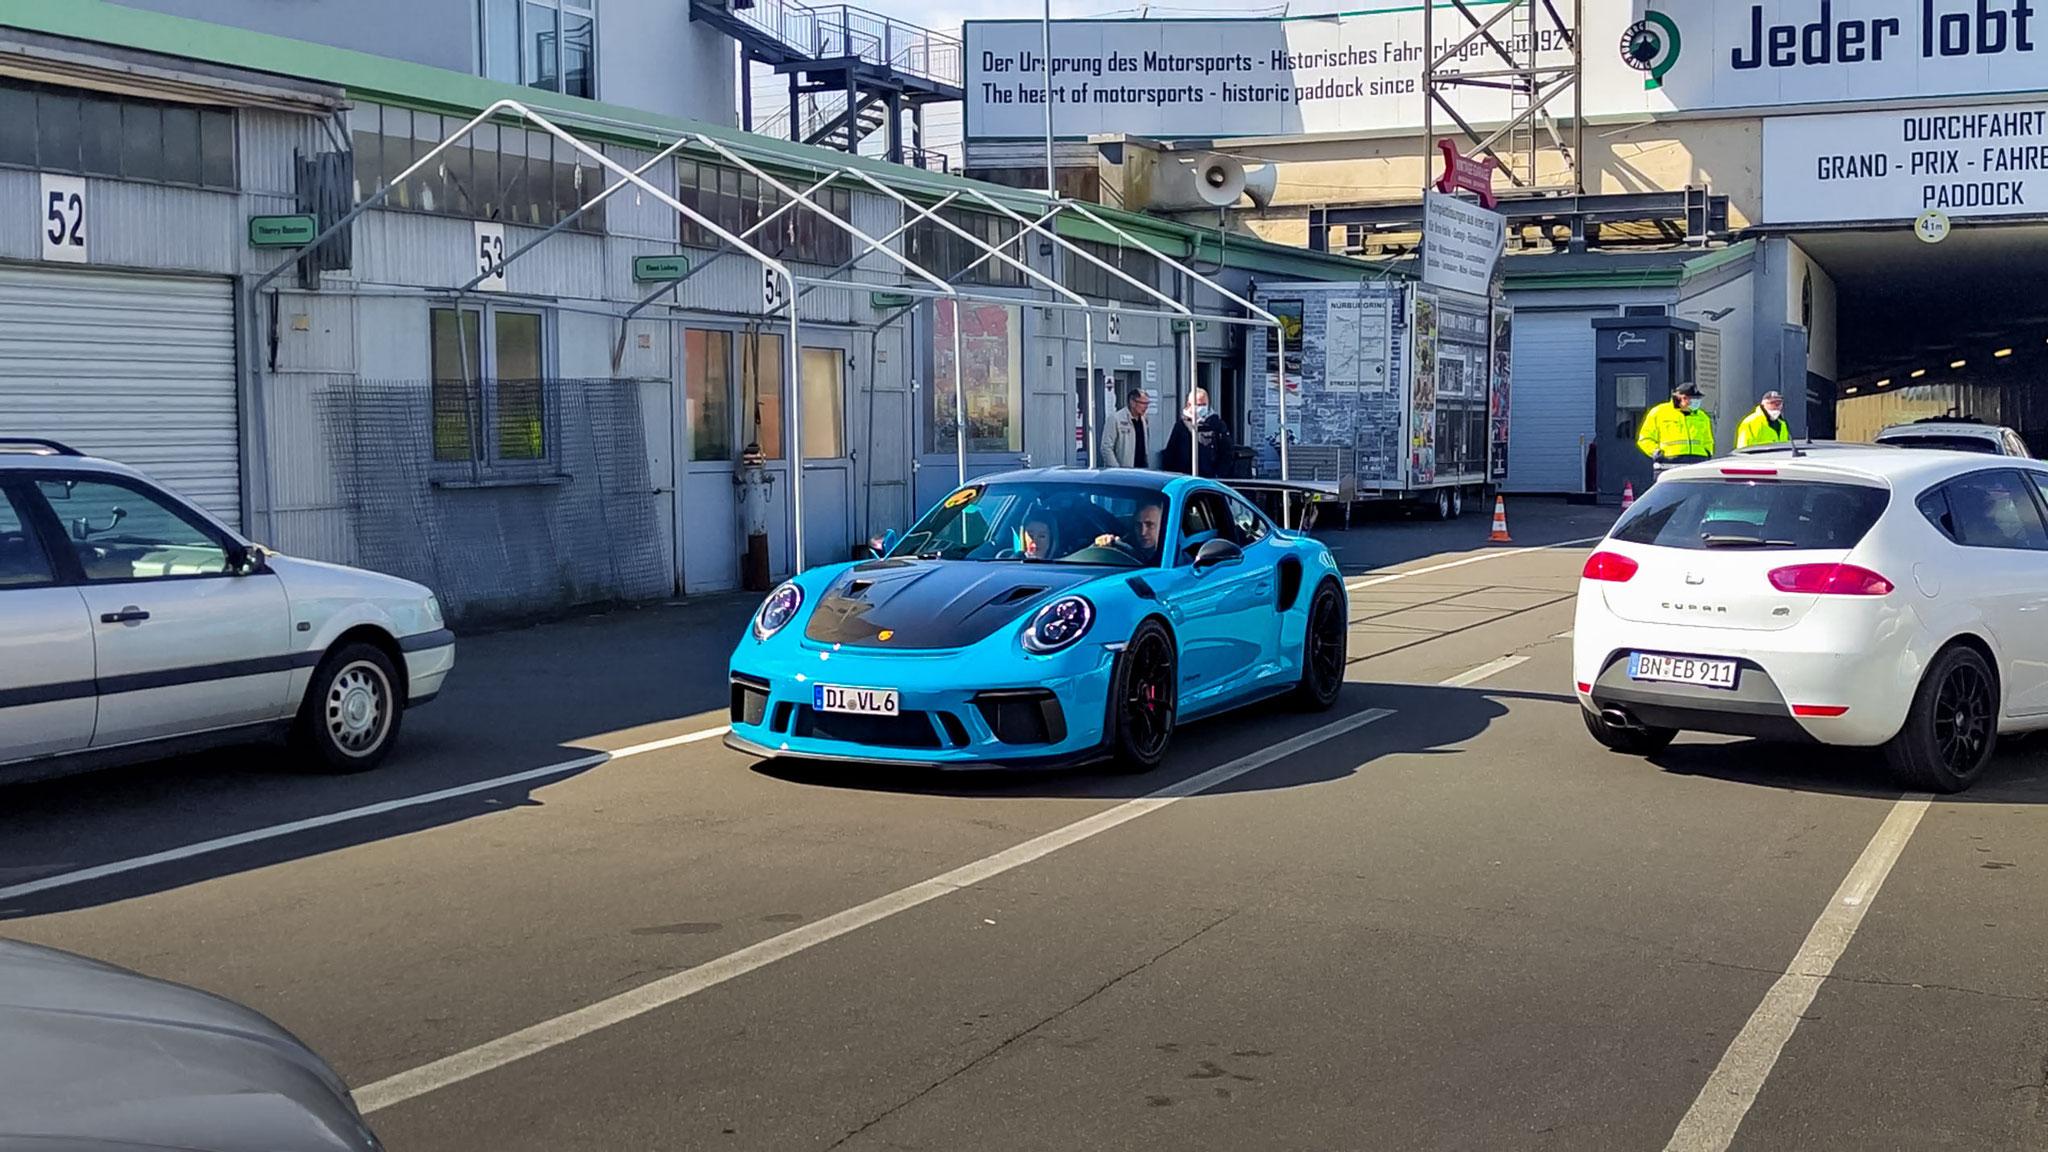 Porsche 911 991.2 GT3 RS - DI-VL-6